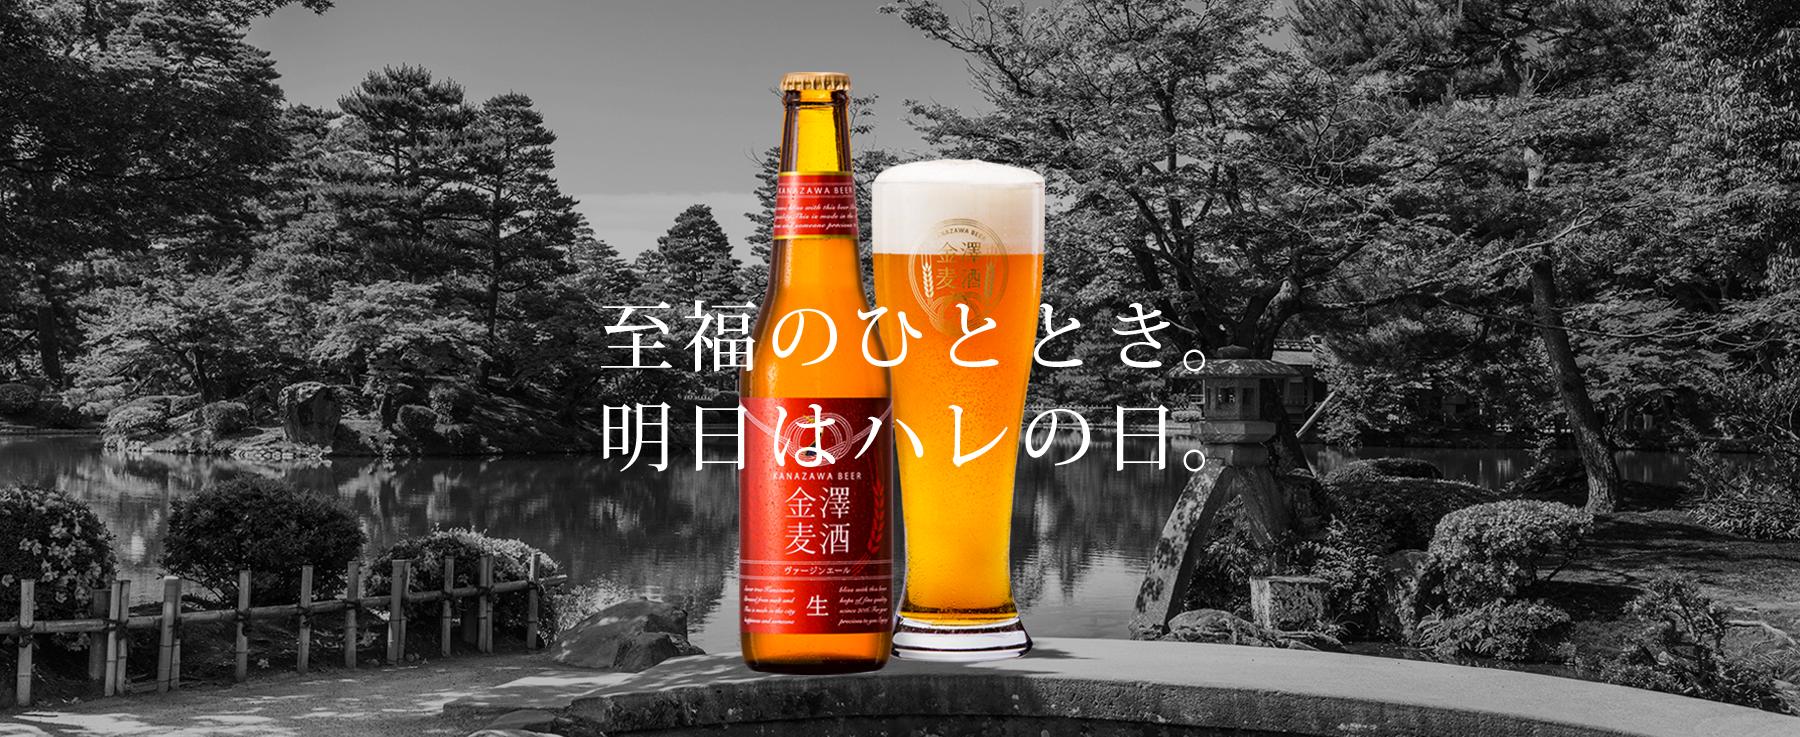 image_kanazawa beer